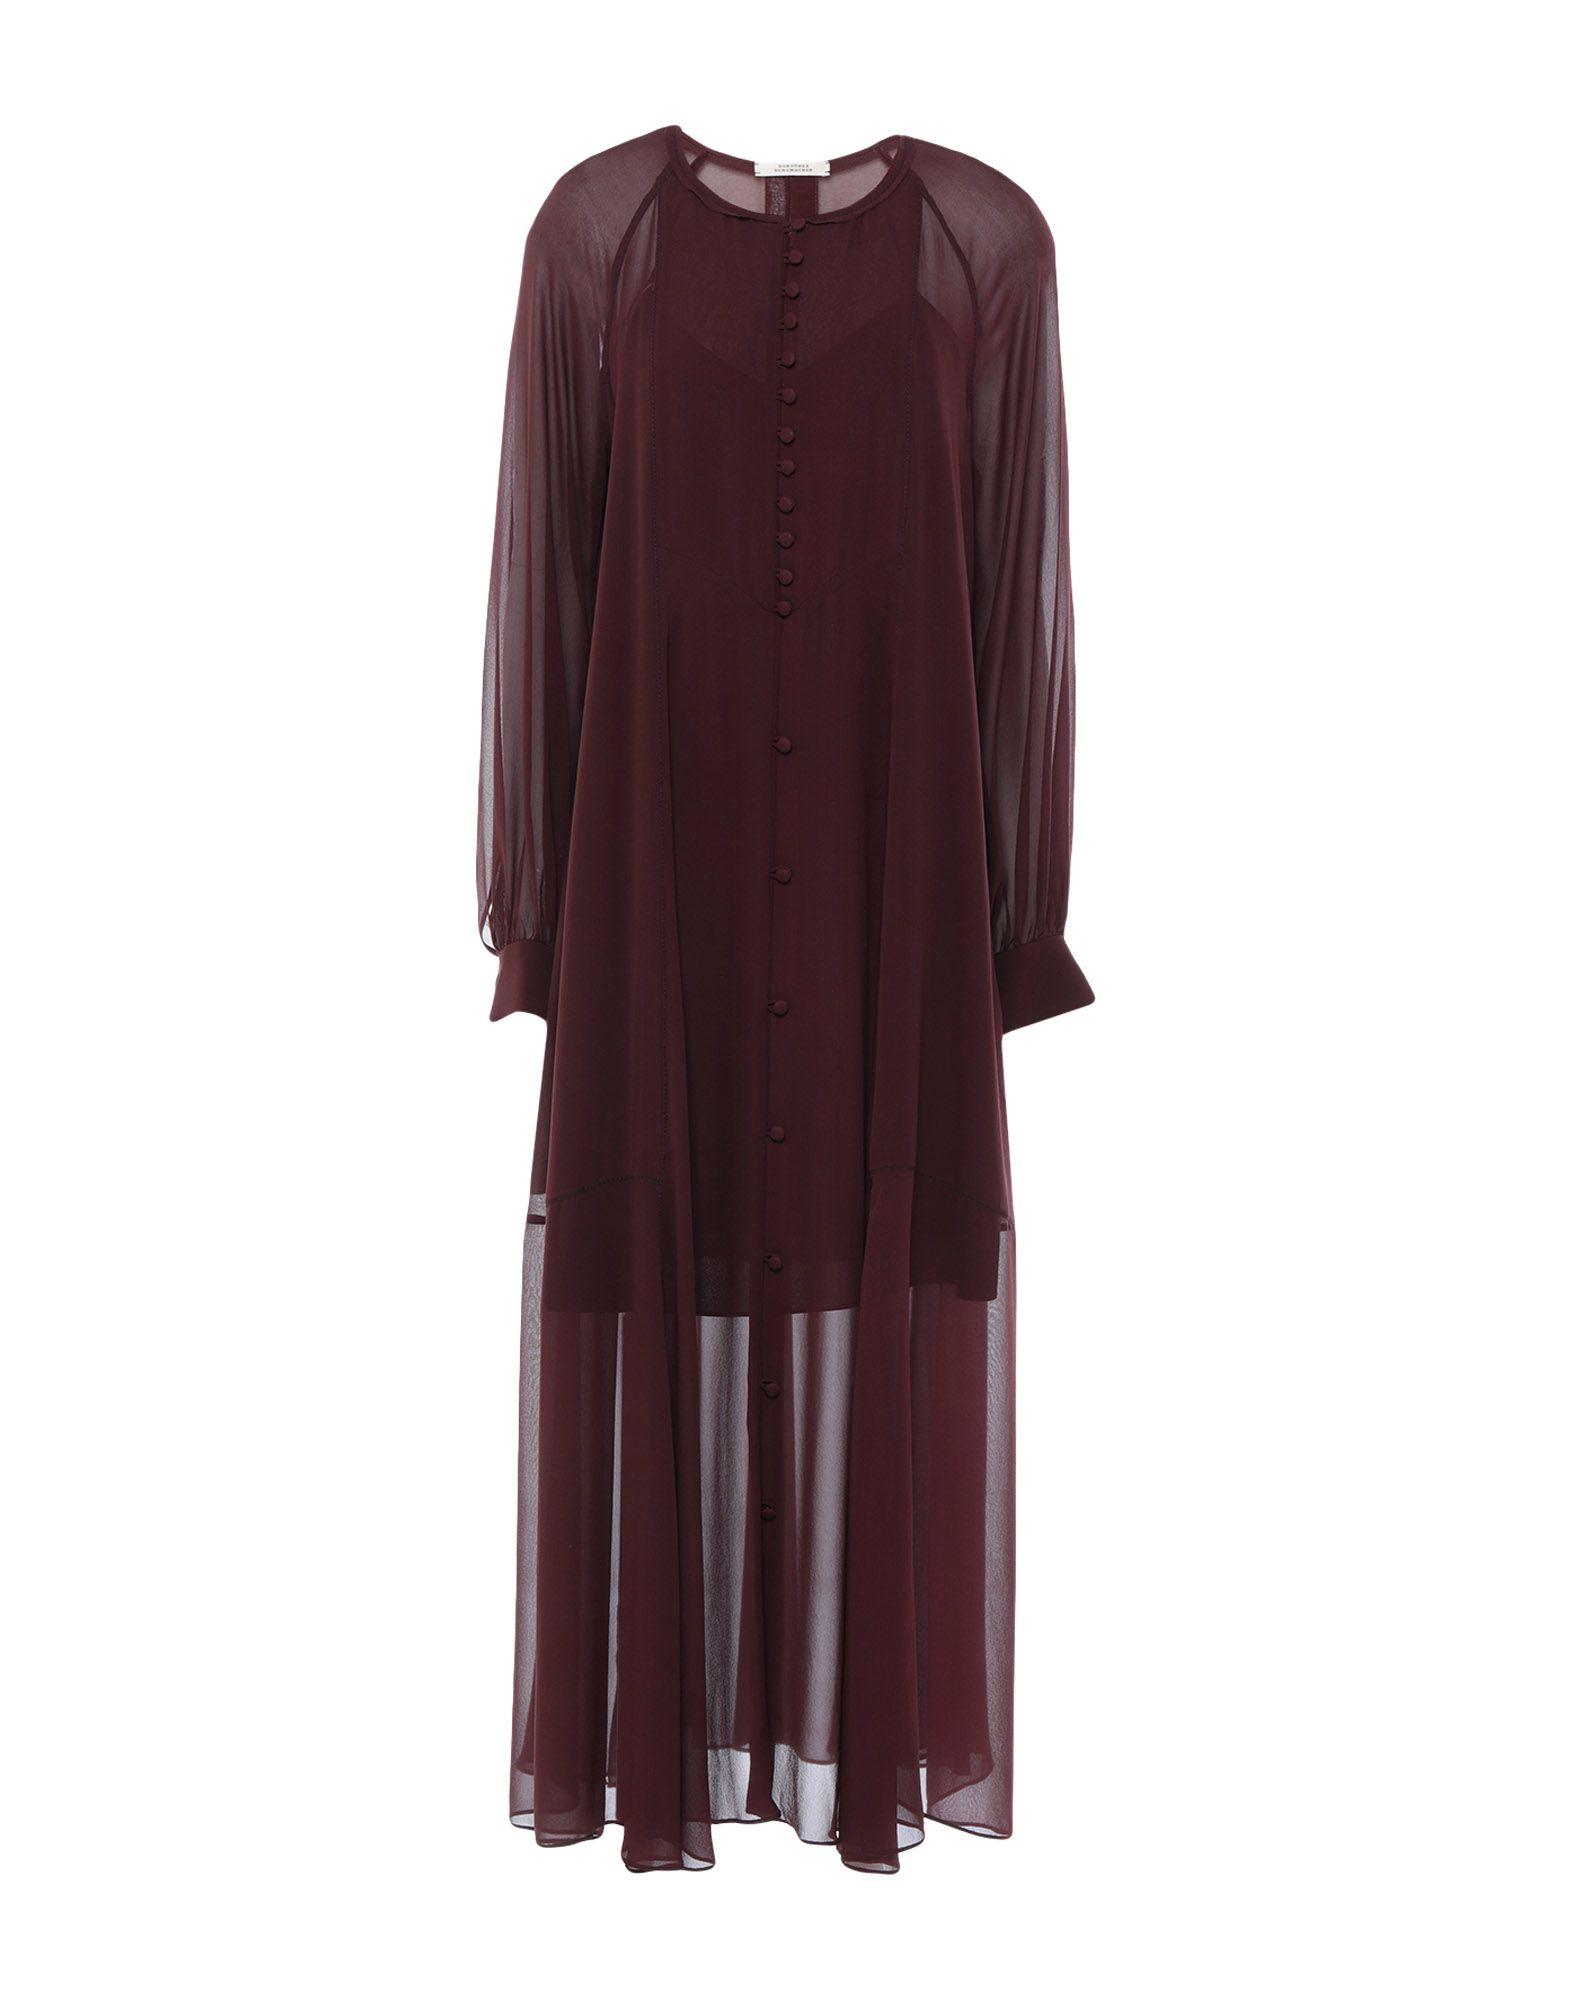 DOROTHEE SCHUMACHER Платье длиной 3/4 dorothee schumacher юбка длиной 3 4